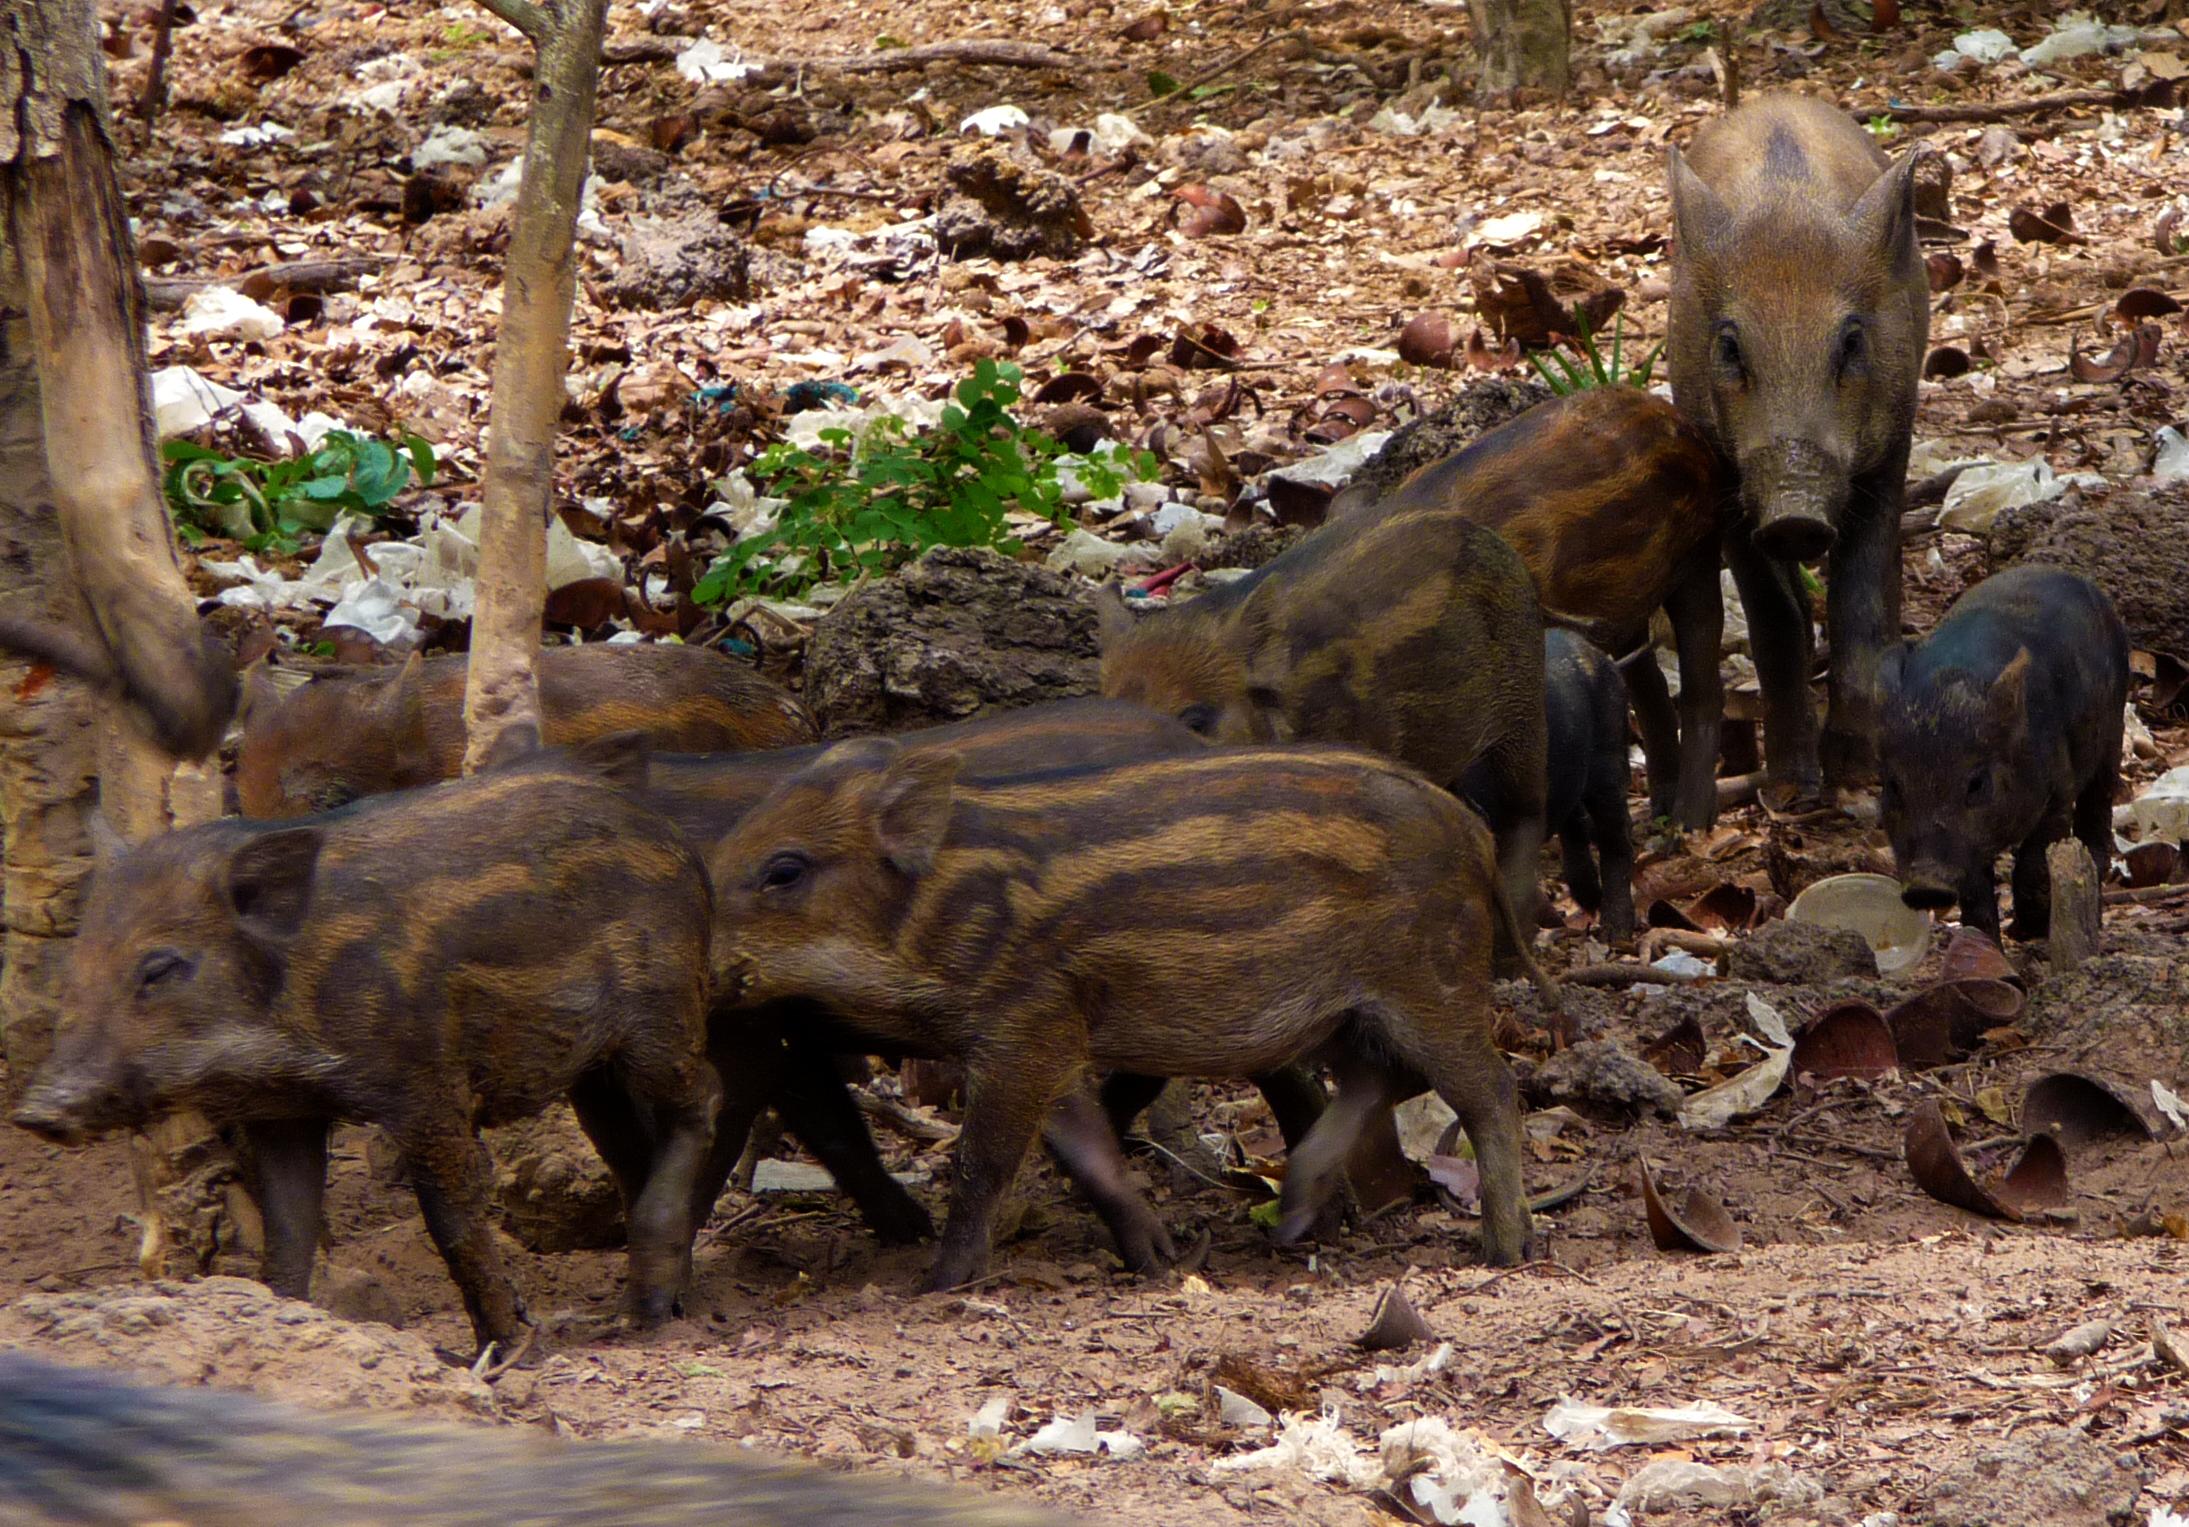 Pig02.jpg